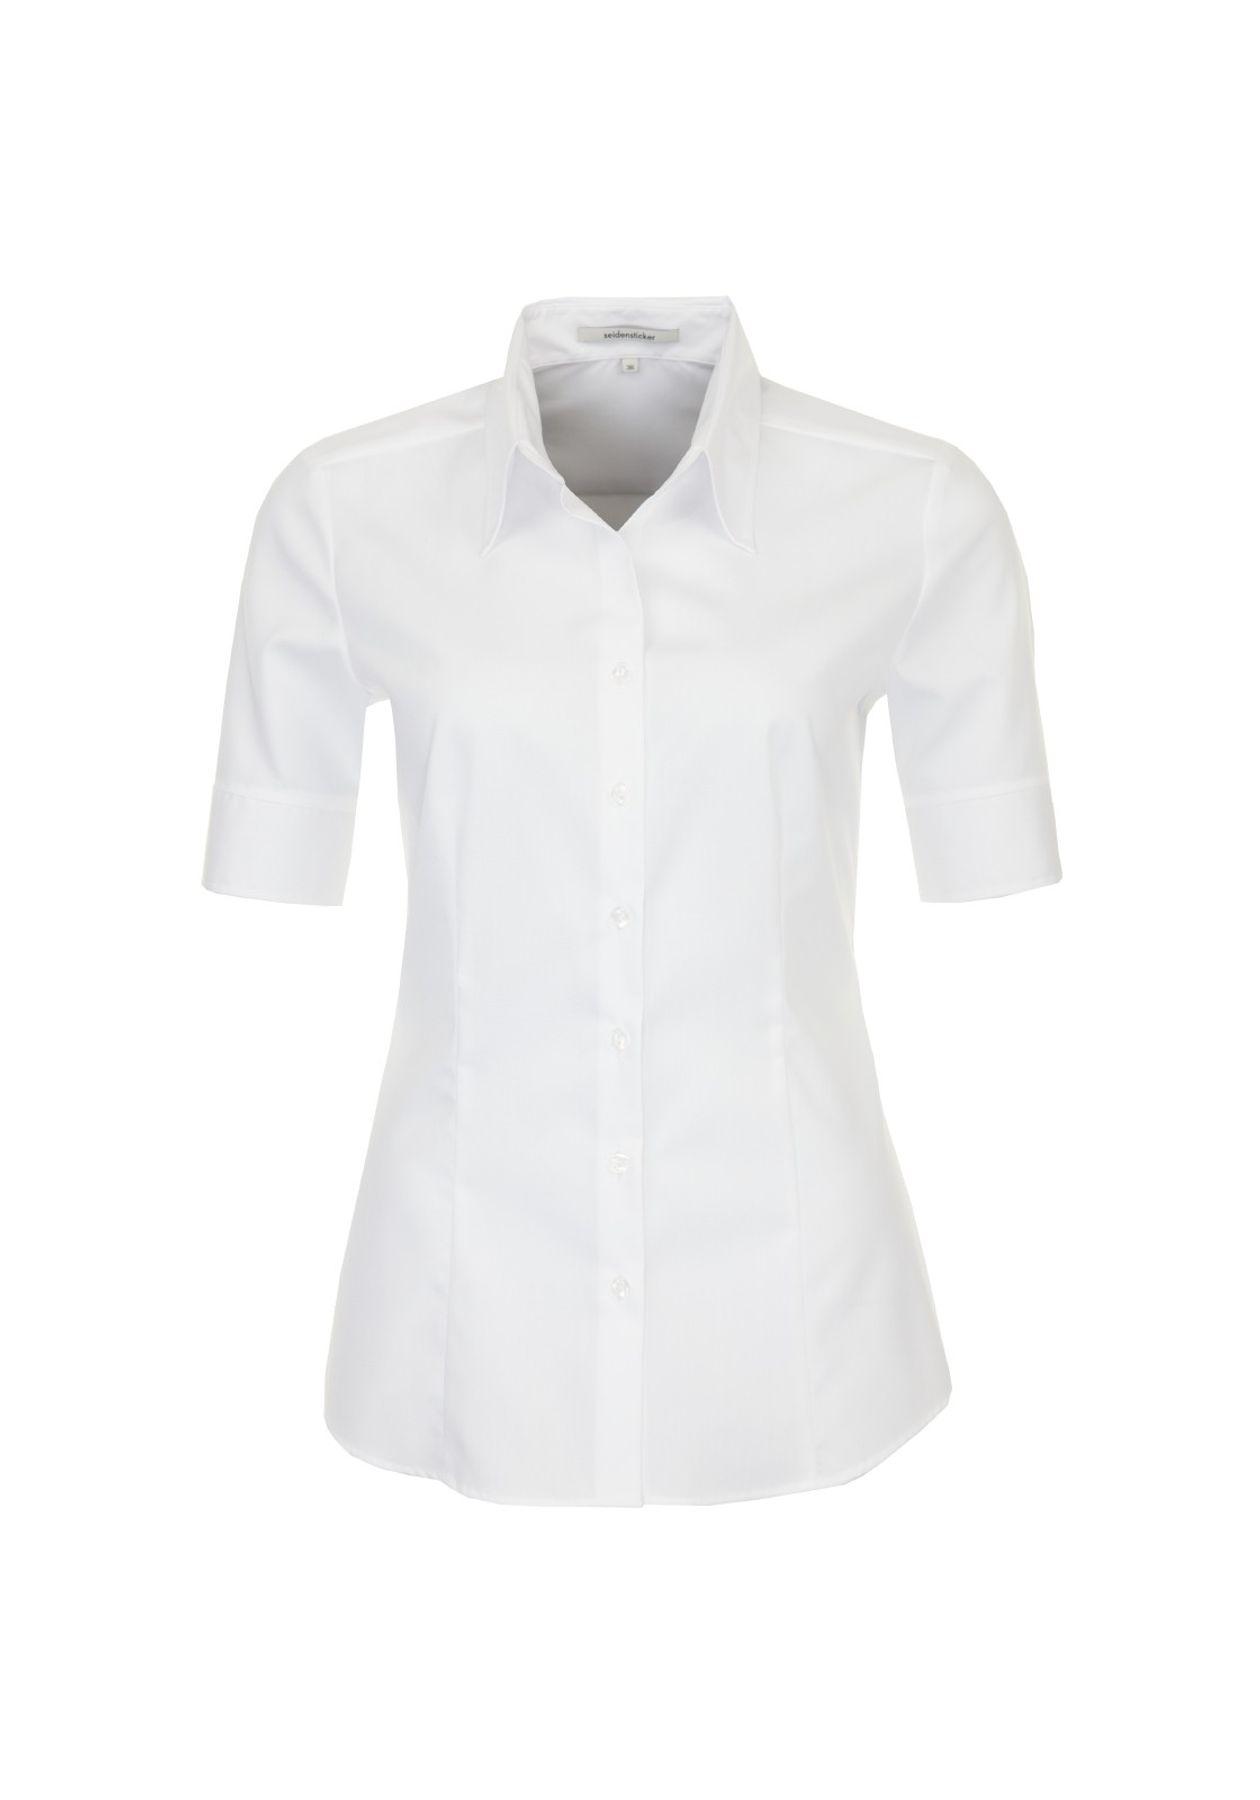 Seidensticker - Regular Fit - Damen City-Bluse 1/2-lang (60.080605) – Bild 4